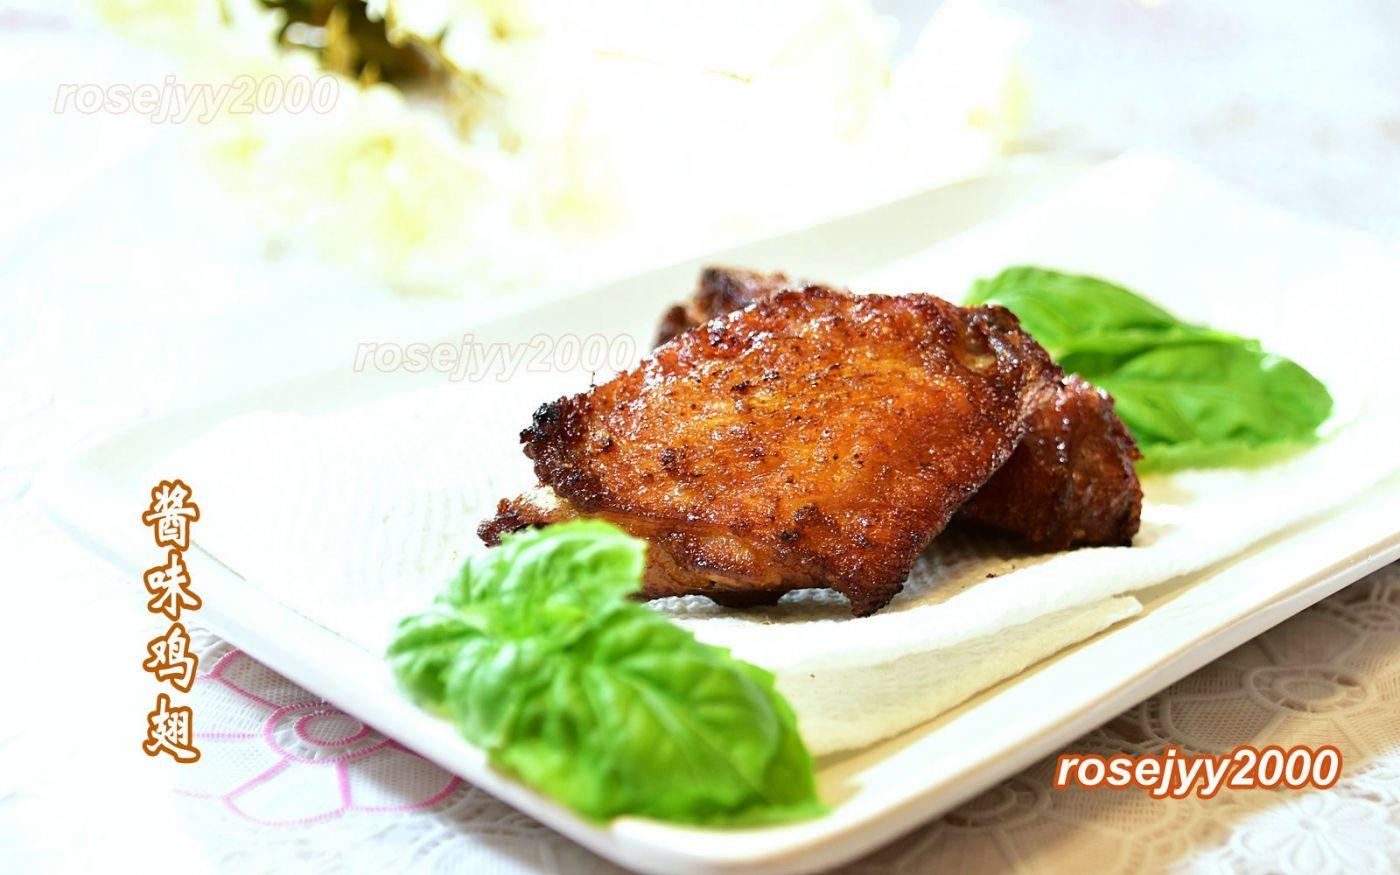 酱味鸡翅_图1-1